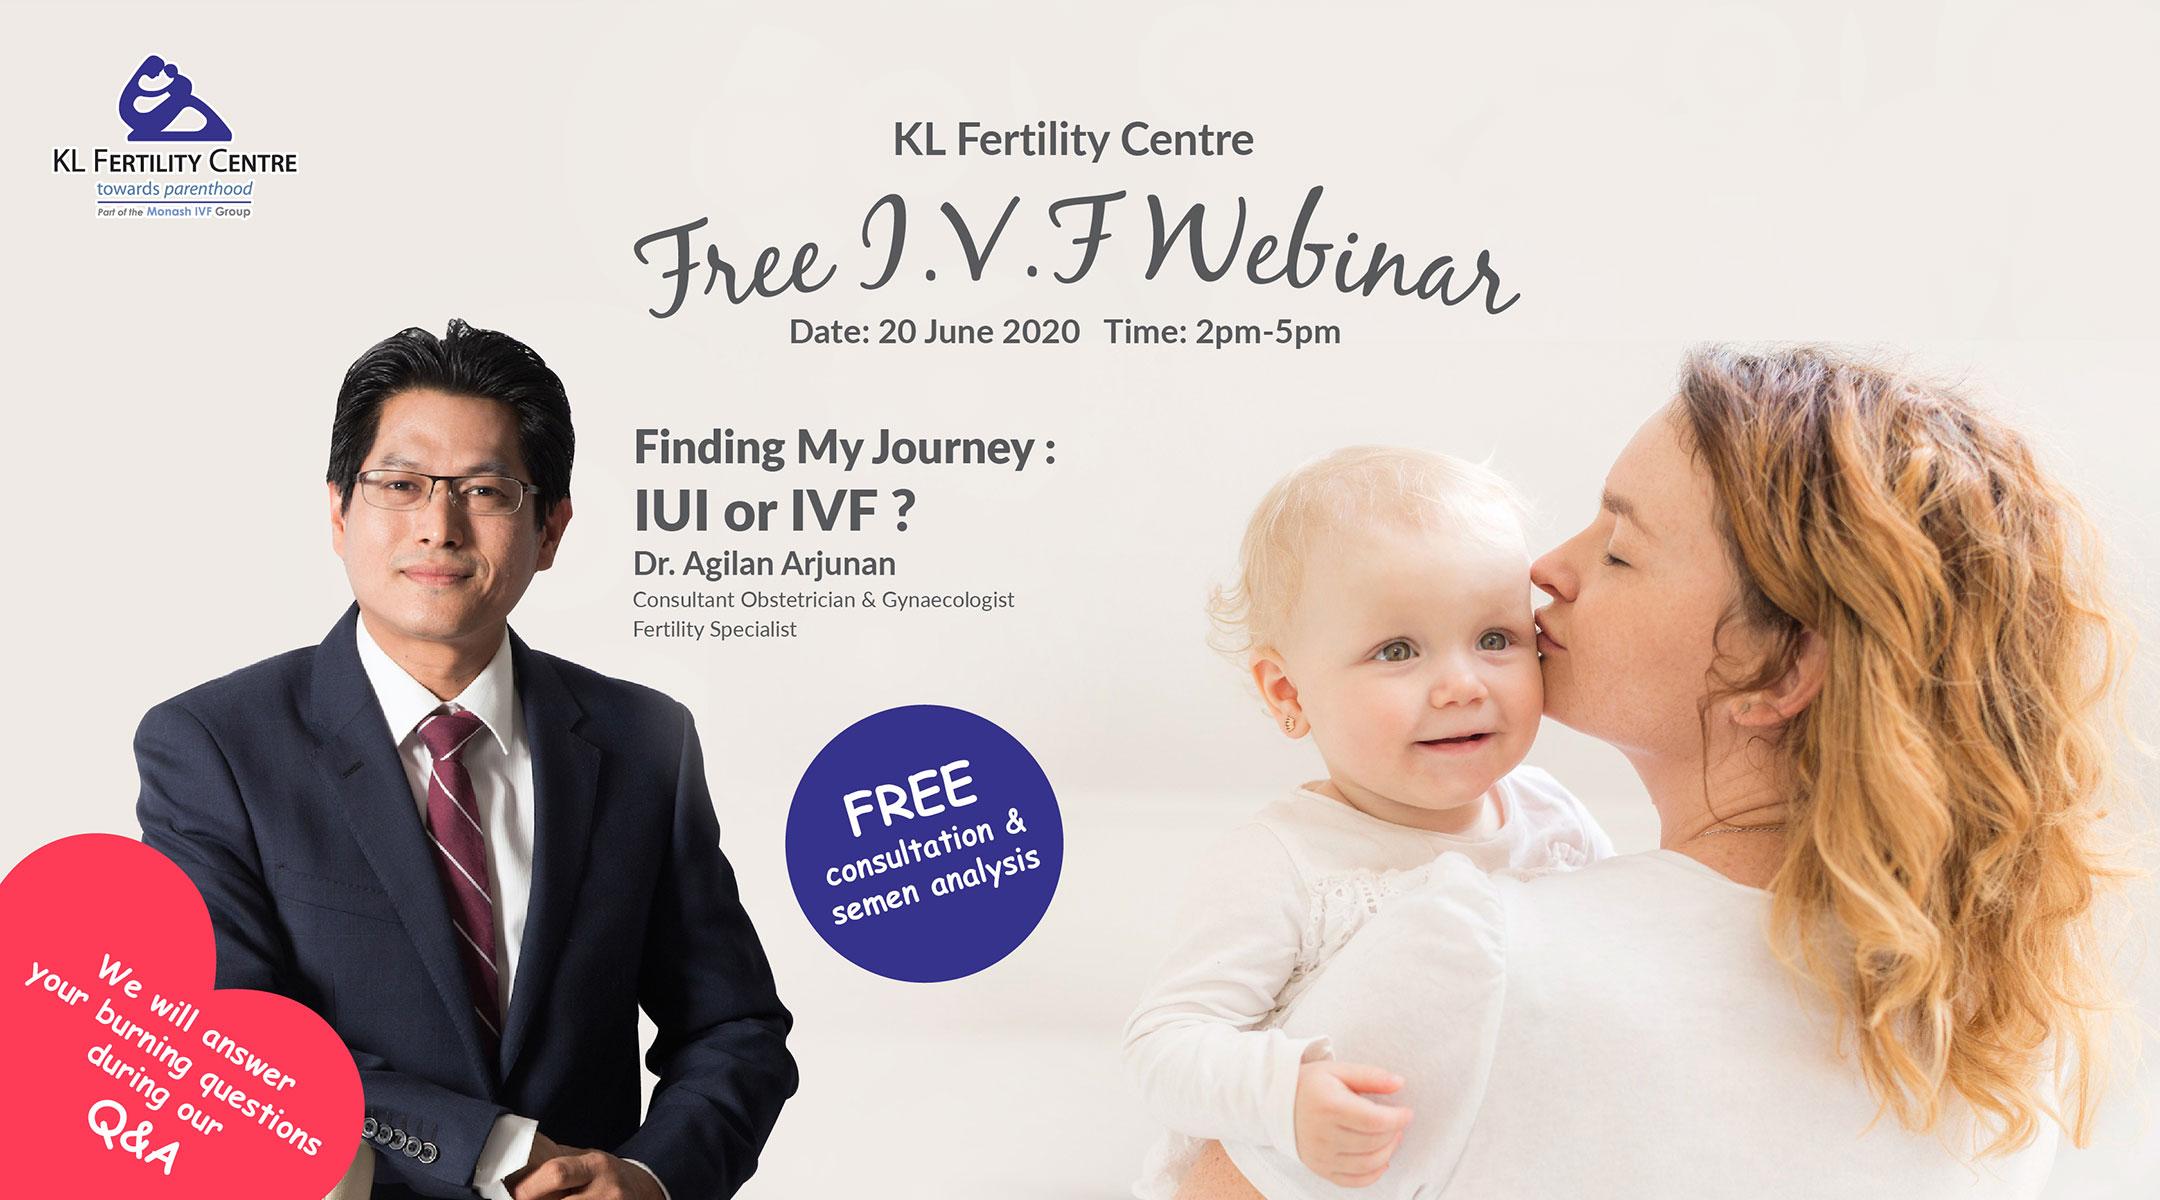 Free IVF Webinar 20 June 2020 - Dr. Agilan Arjunan